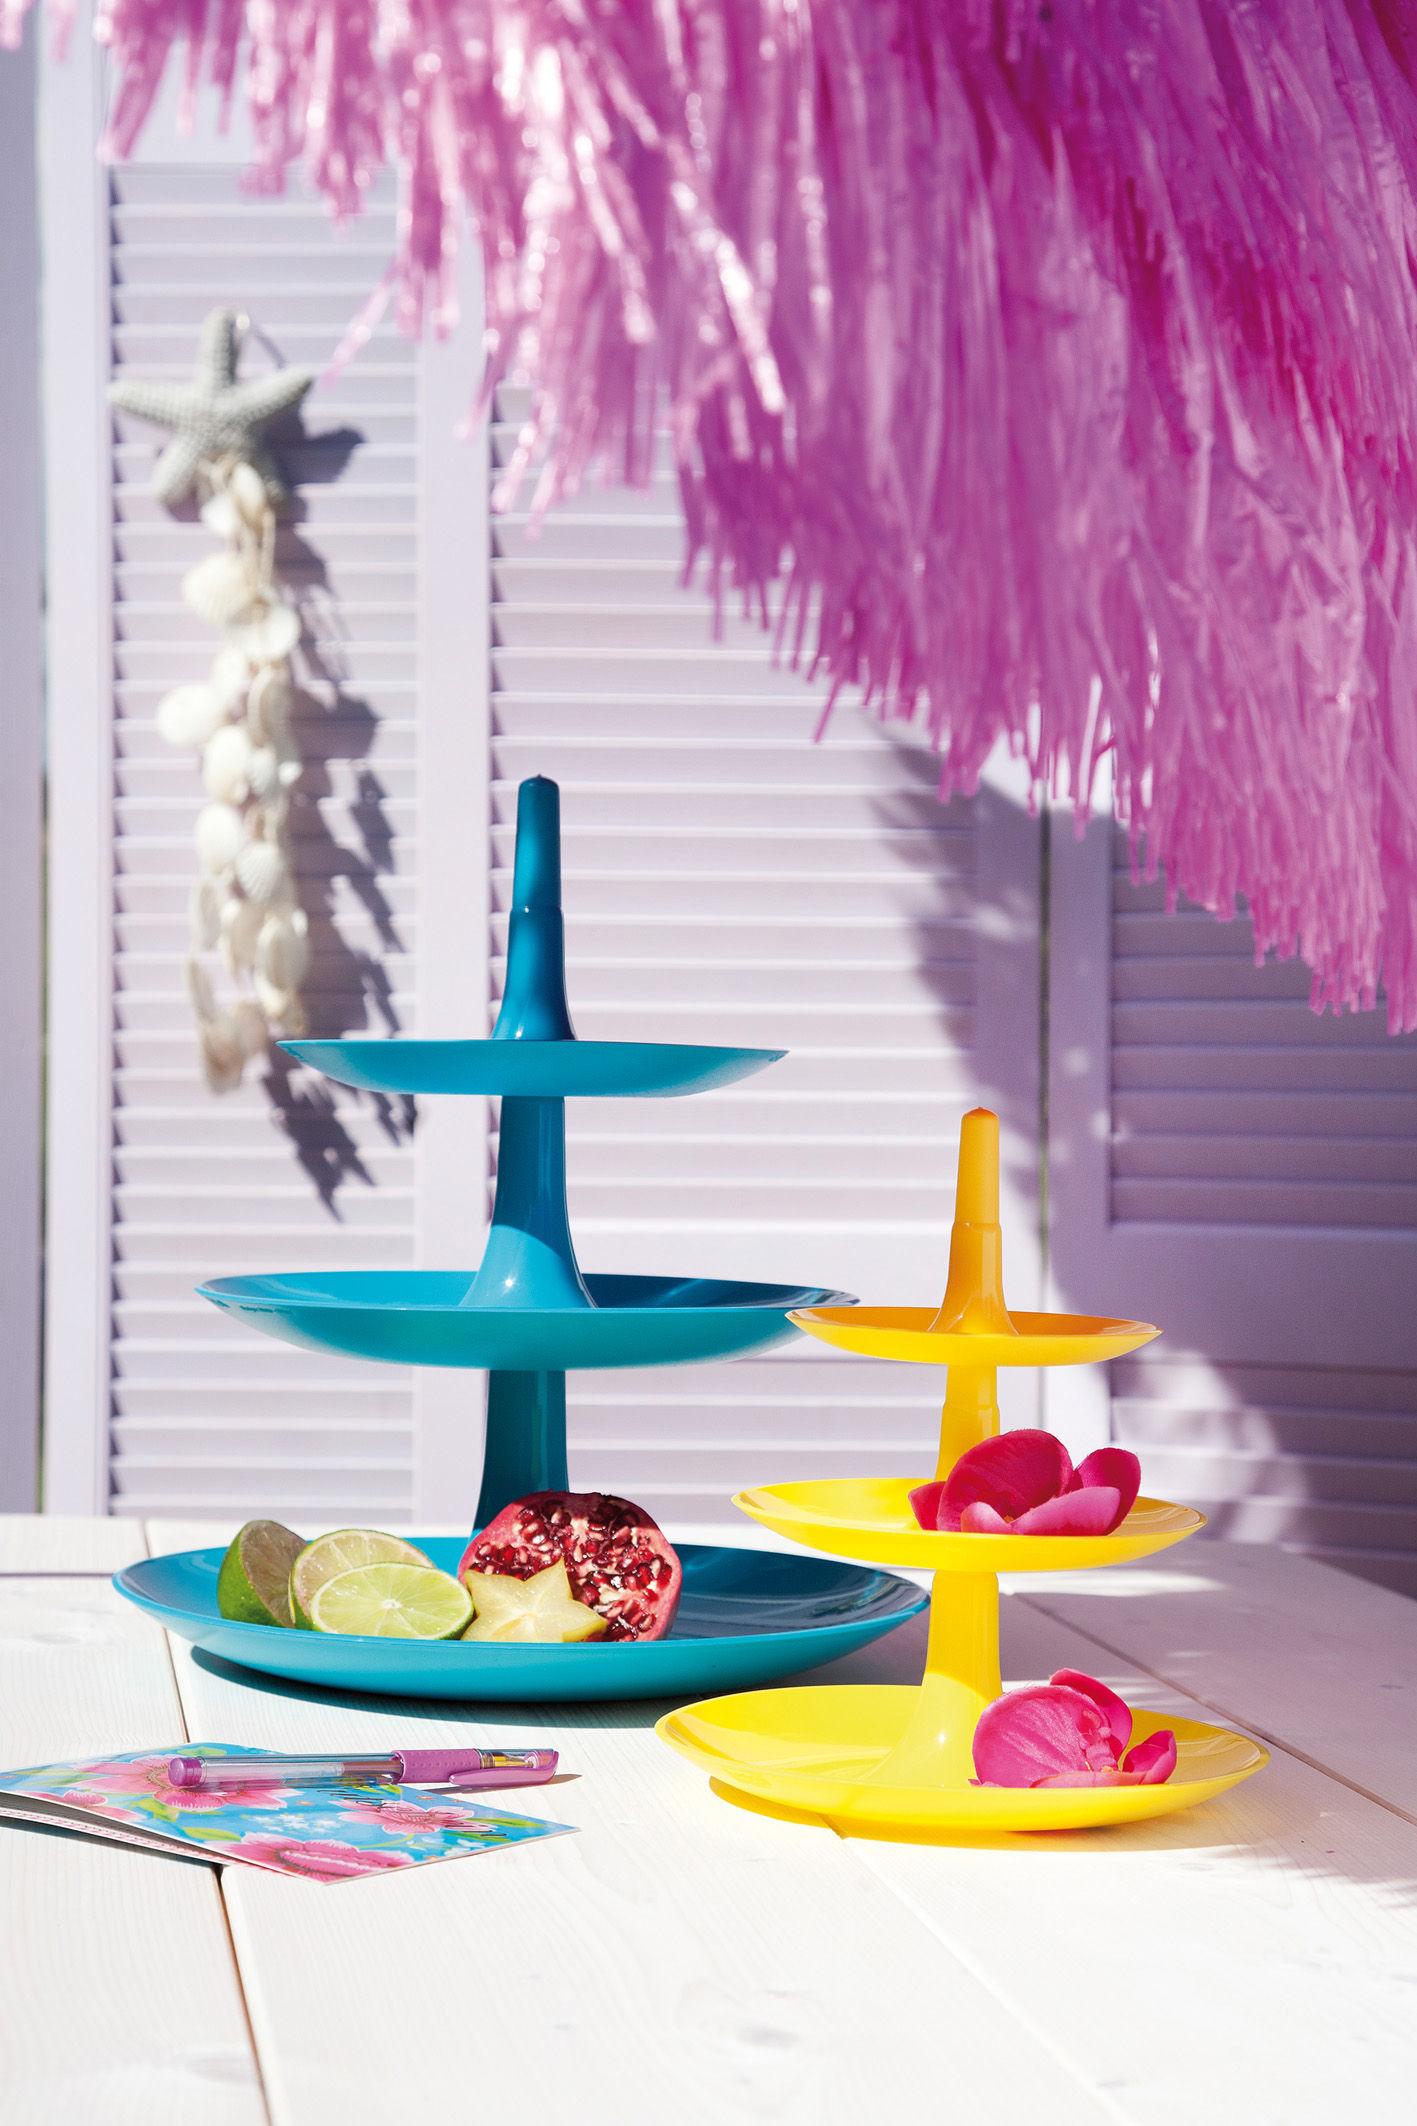 porte fruits babell 31 4 x h 34 cm bleu oc an opaque koziol. Black Bedroom Furniture Sets. Home Design Ideas